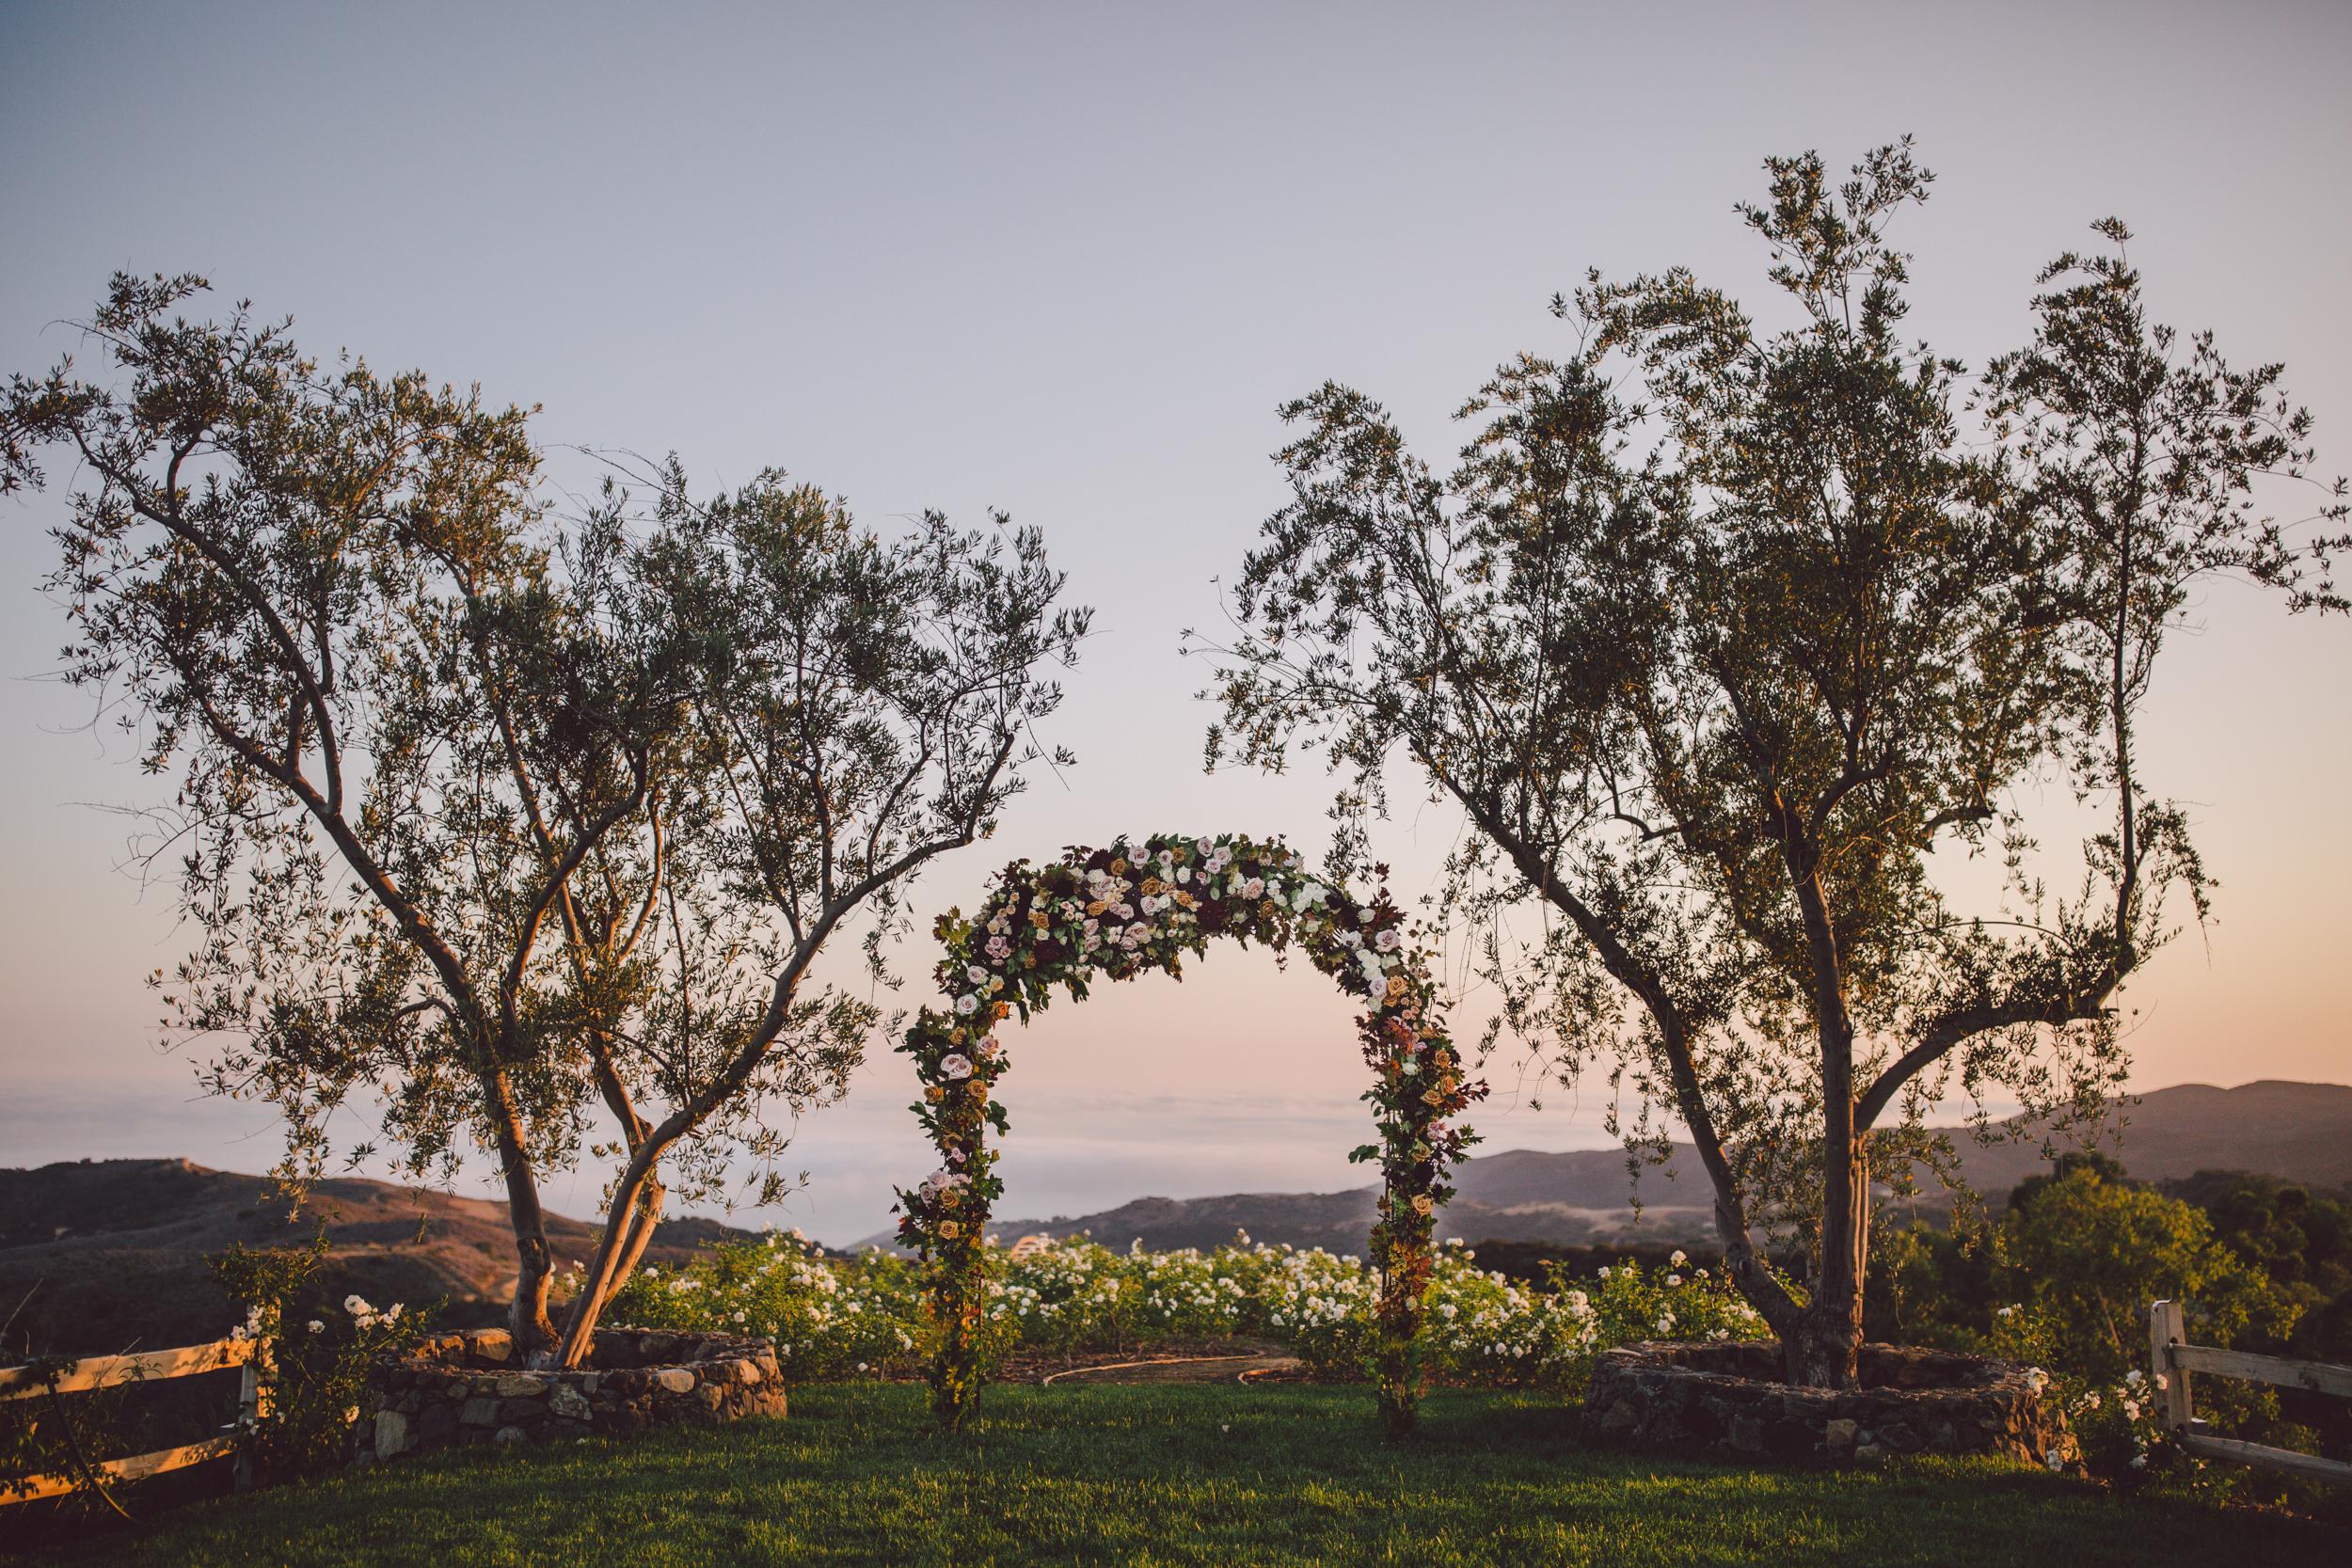 romantic-boho-stonewall ranch-malibu-sunset-ceremony-floral arch